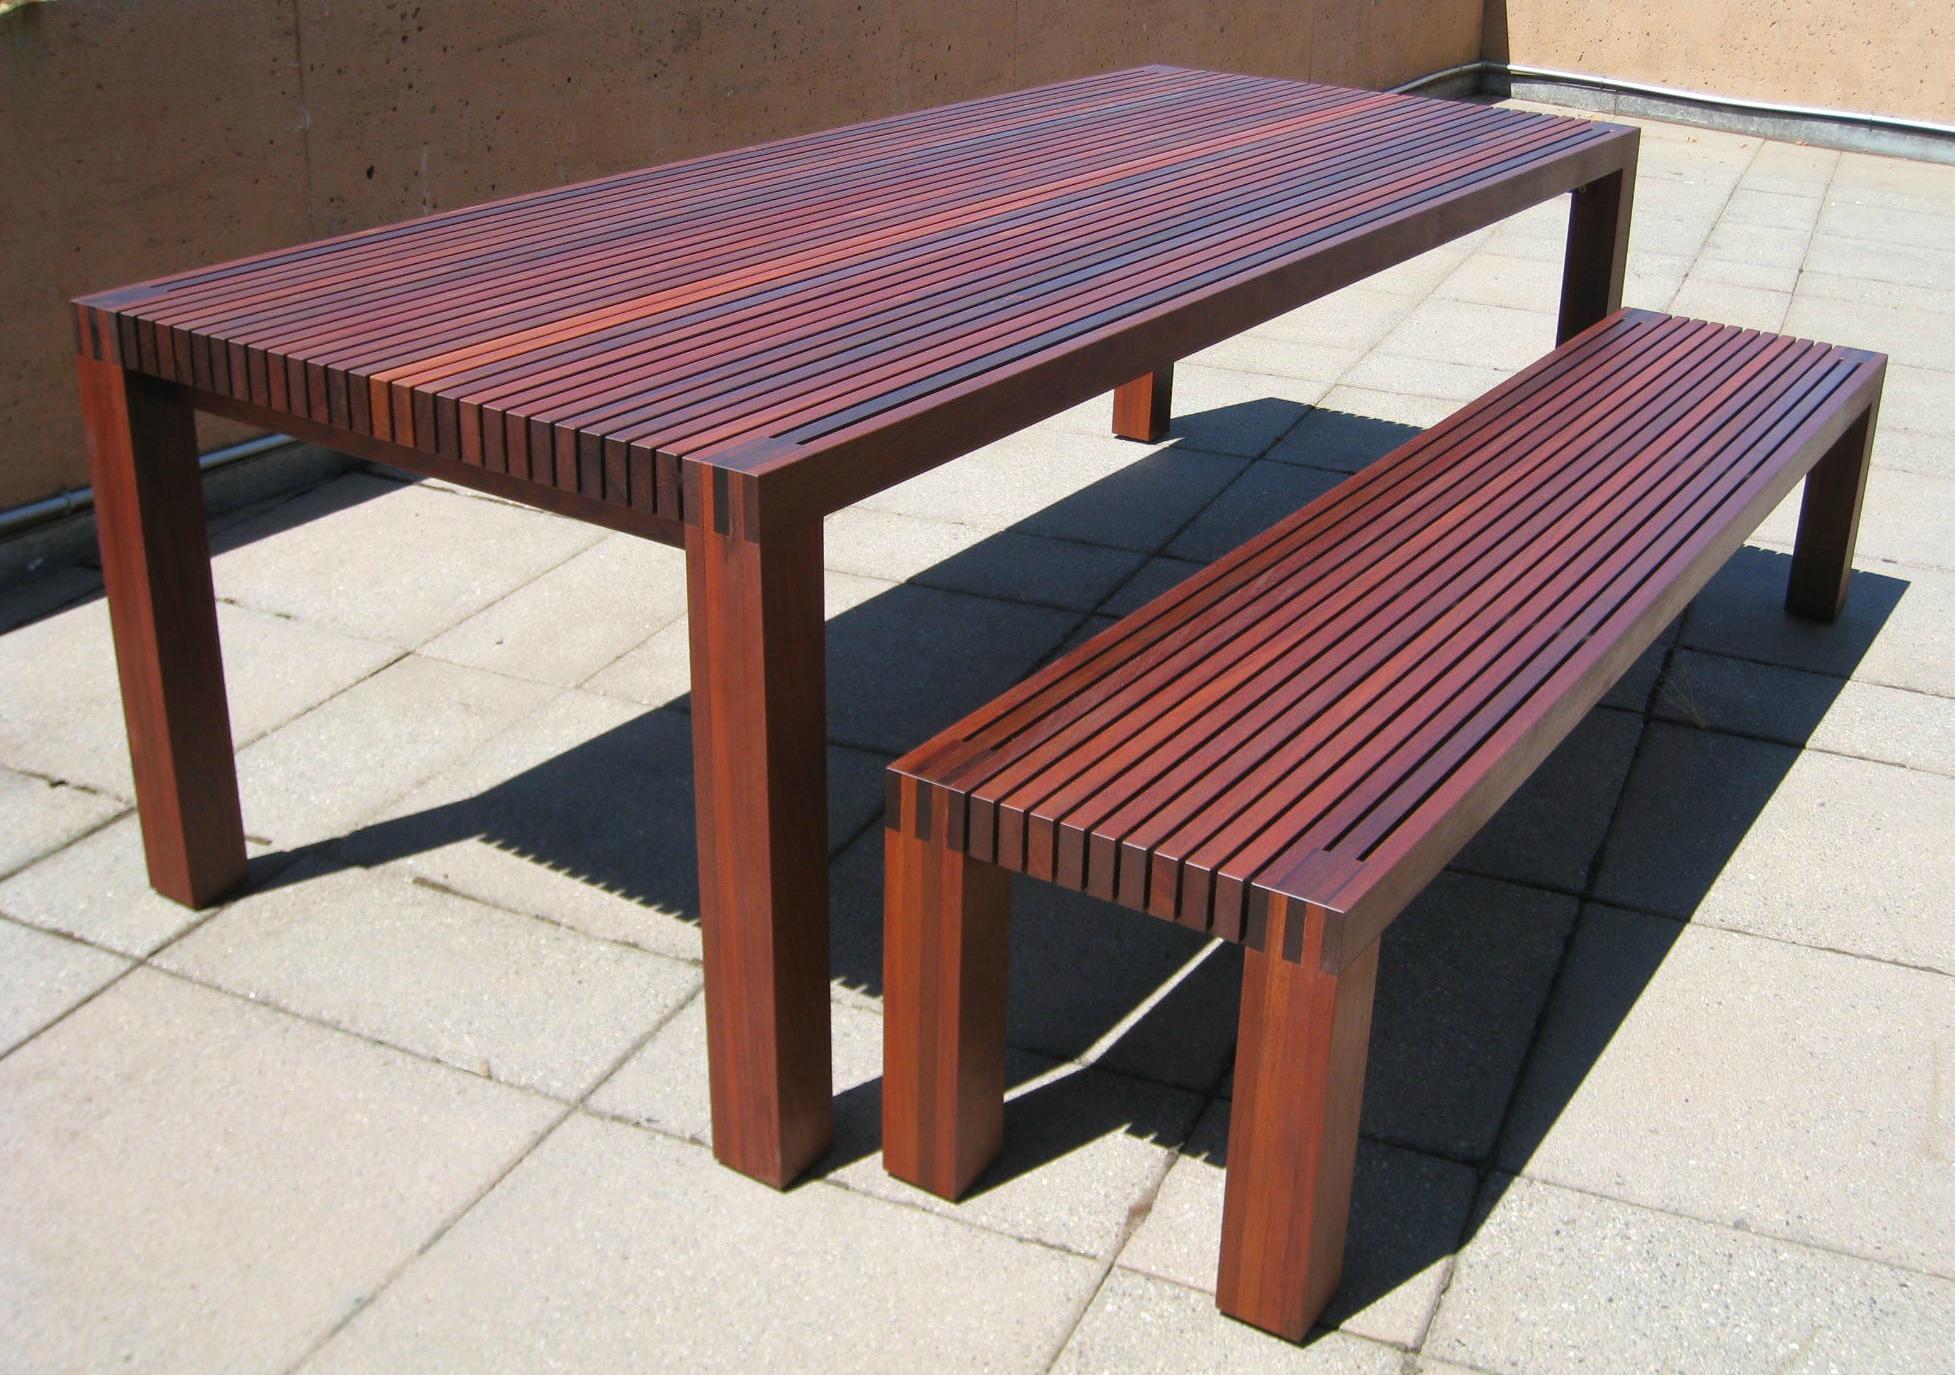 Garden Furniture Decking ipe wood table monclerfactoryoutletscom. outdoor furniture